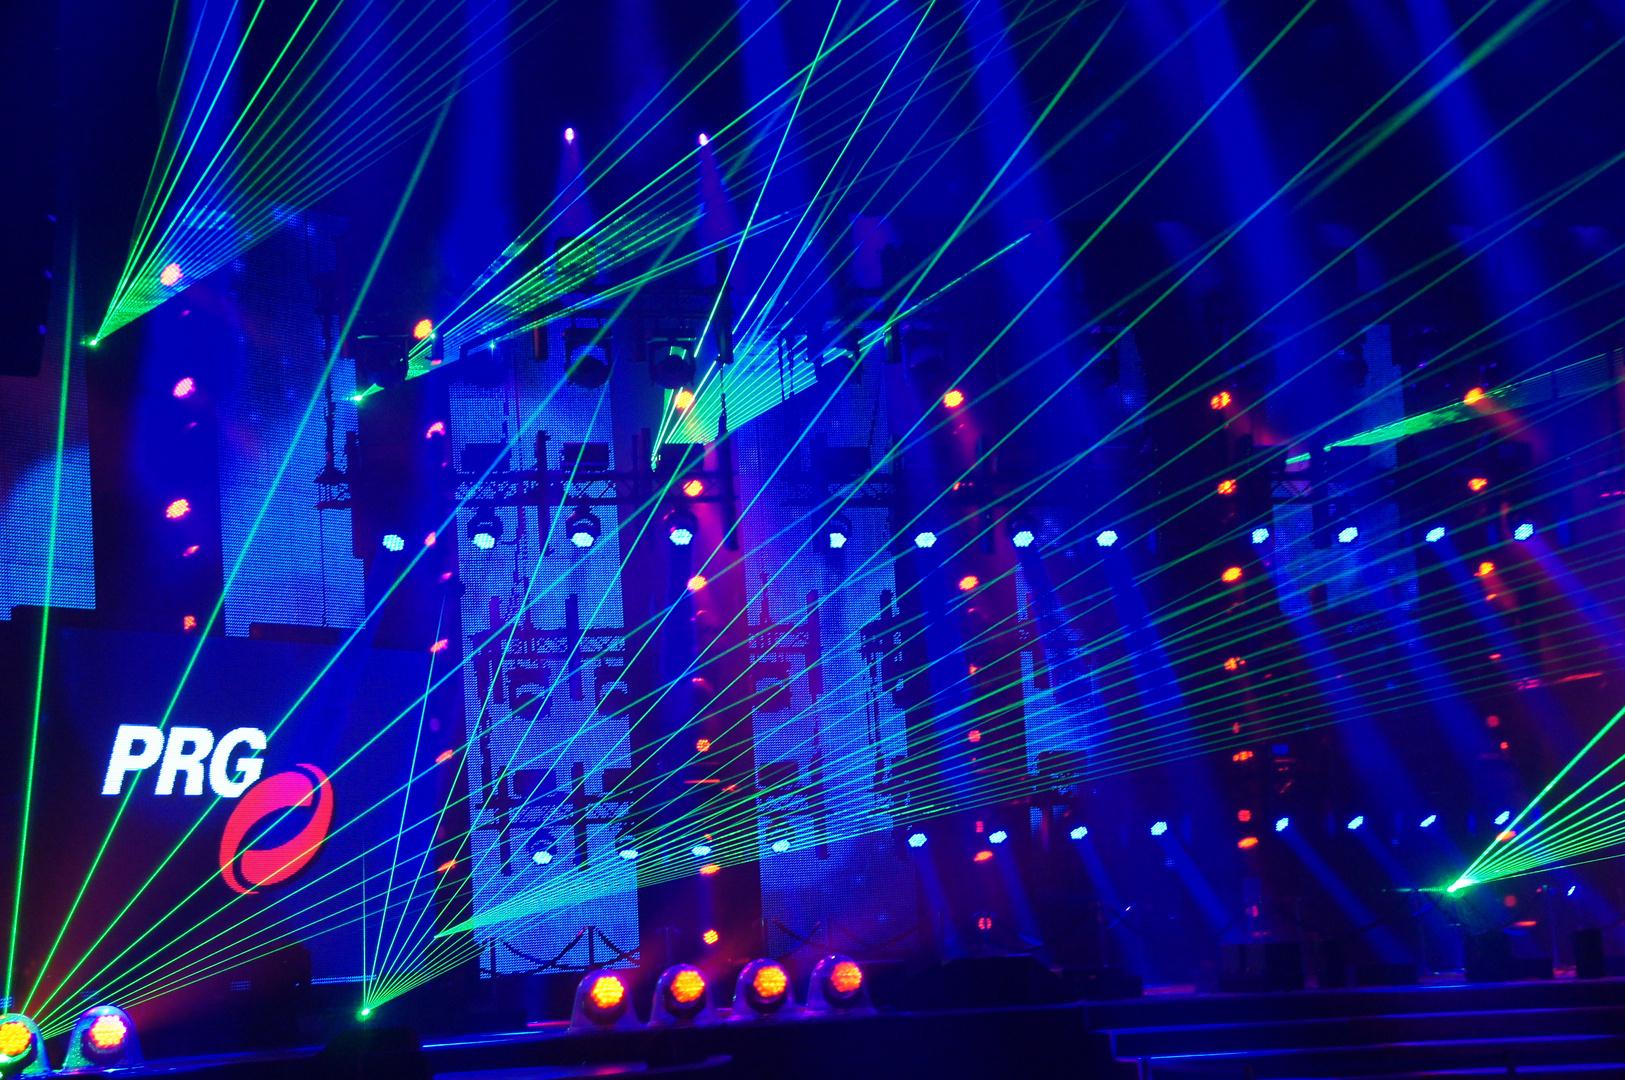 PRG Light and Sound Show: Laser (1)